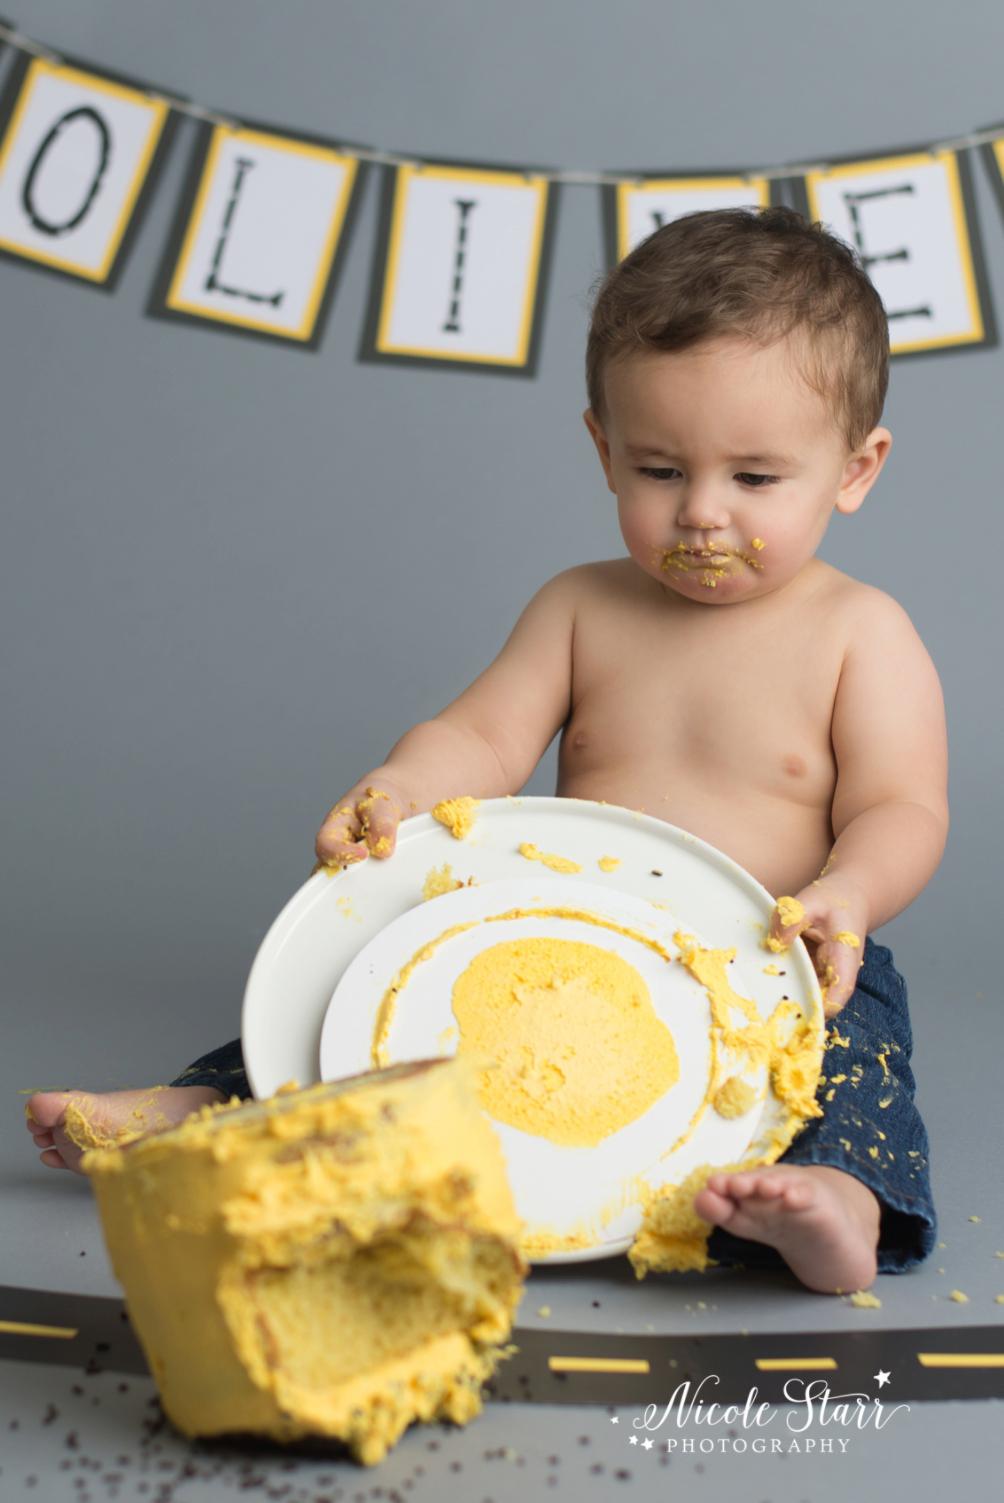 upstate new york saratoga albany cake smash first birthday baby photographer_0007.jpg